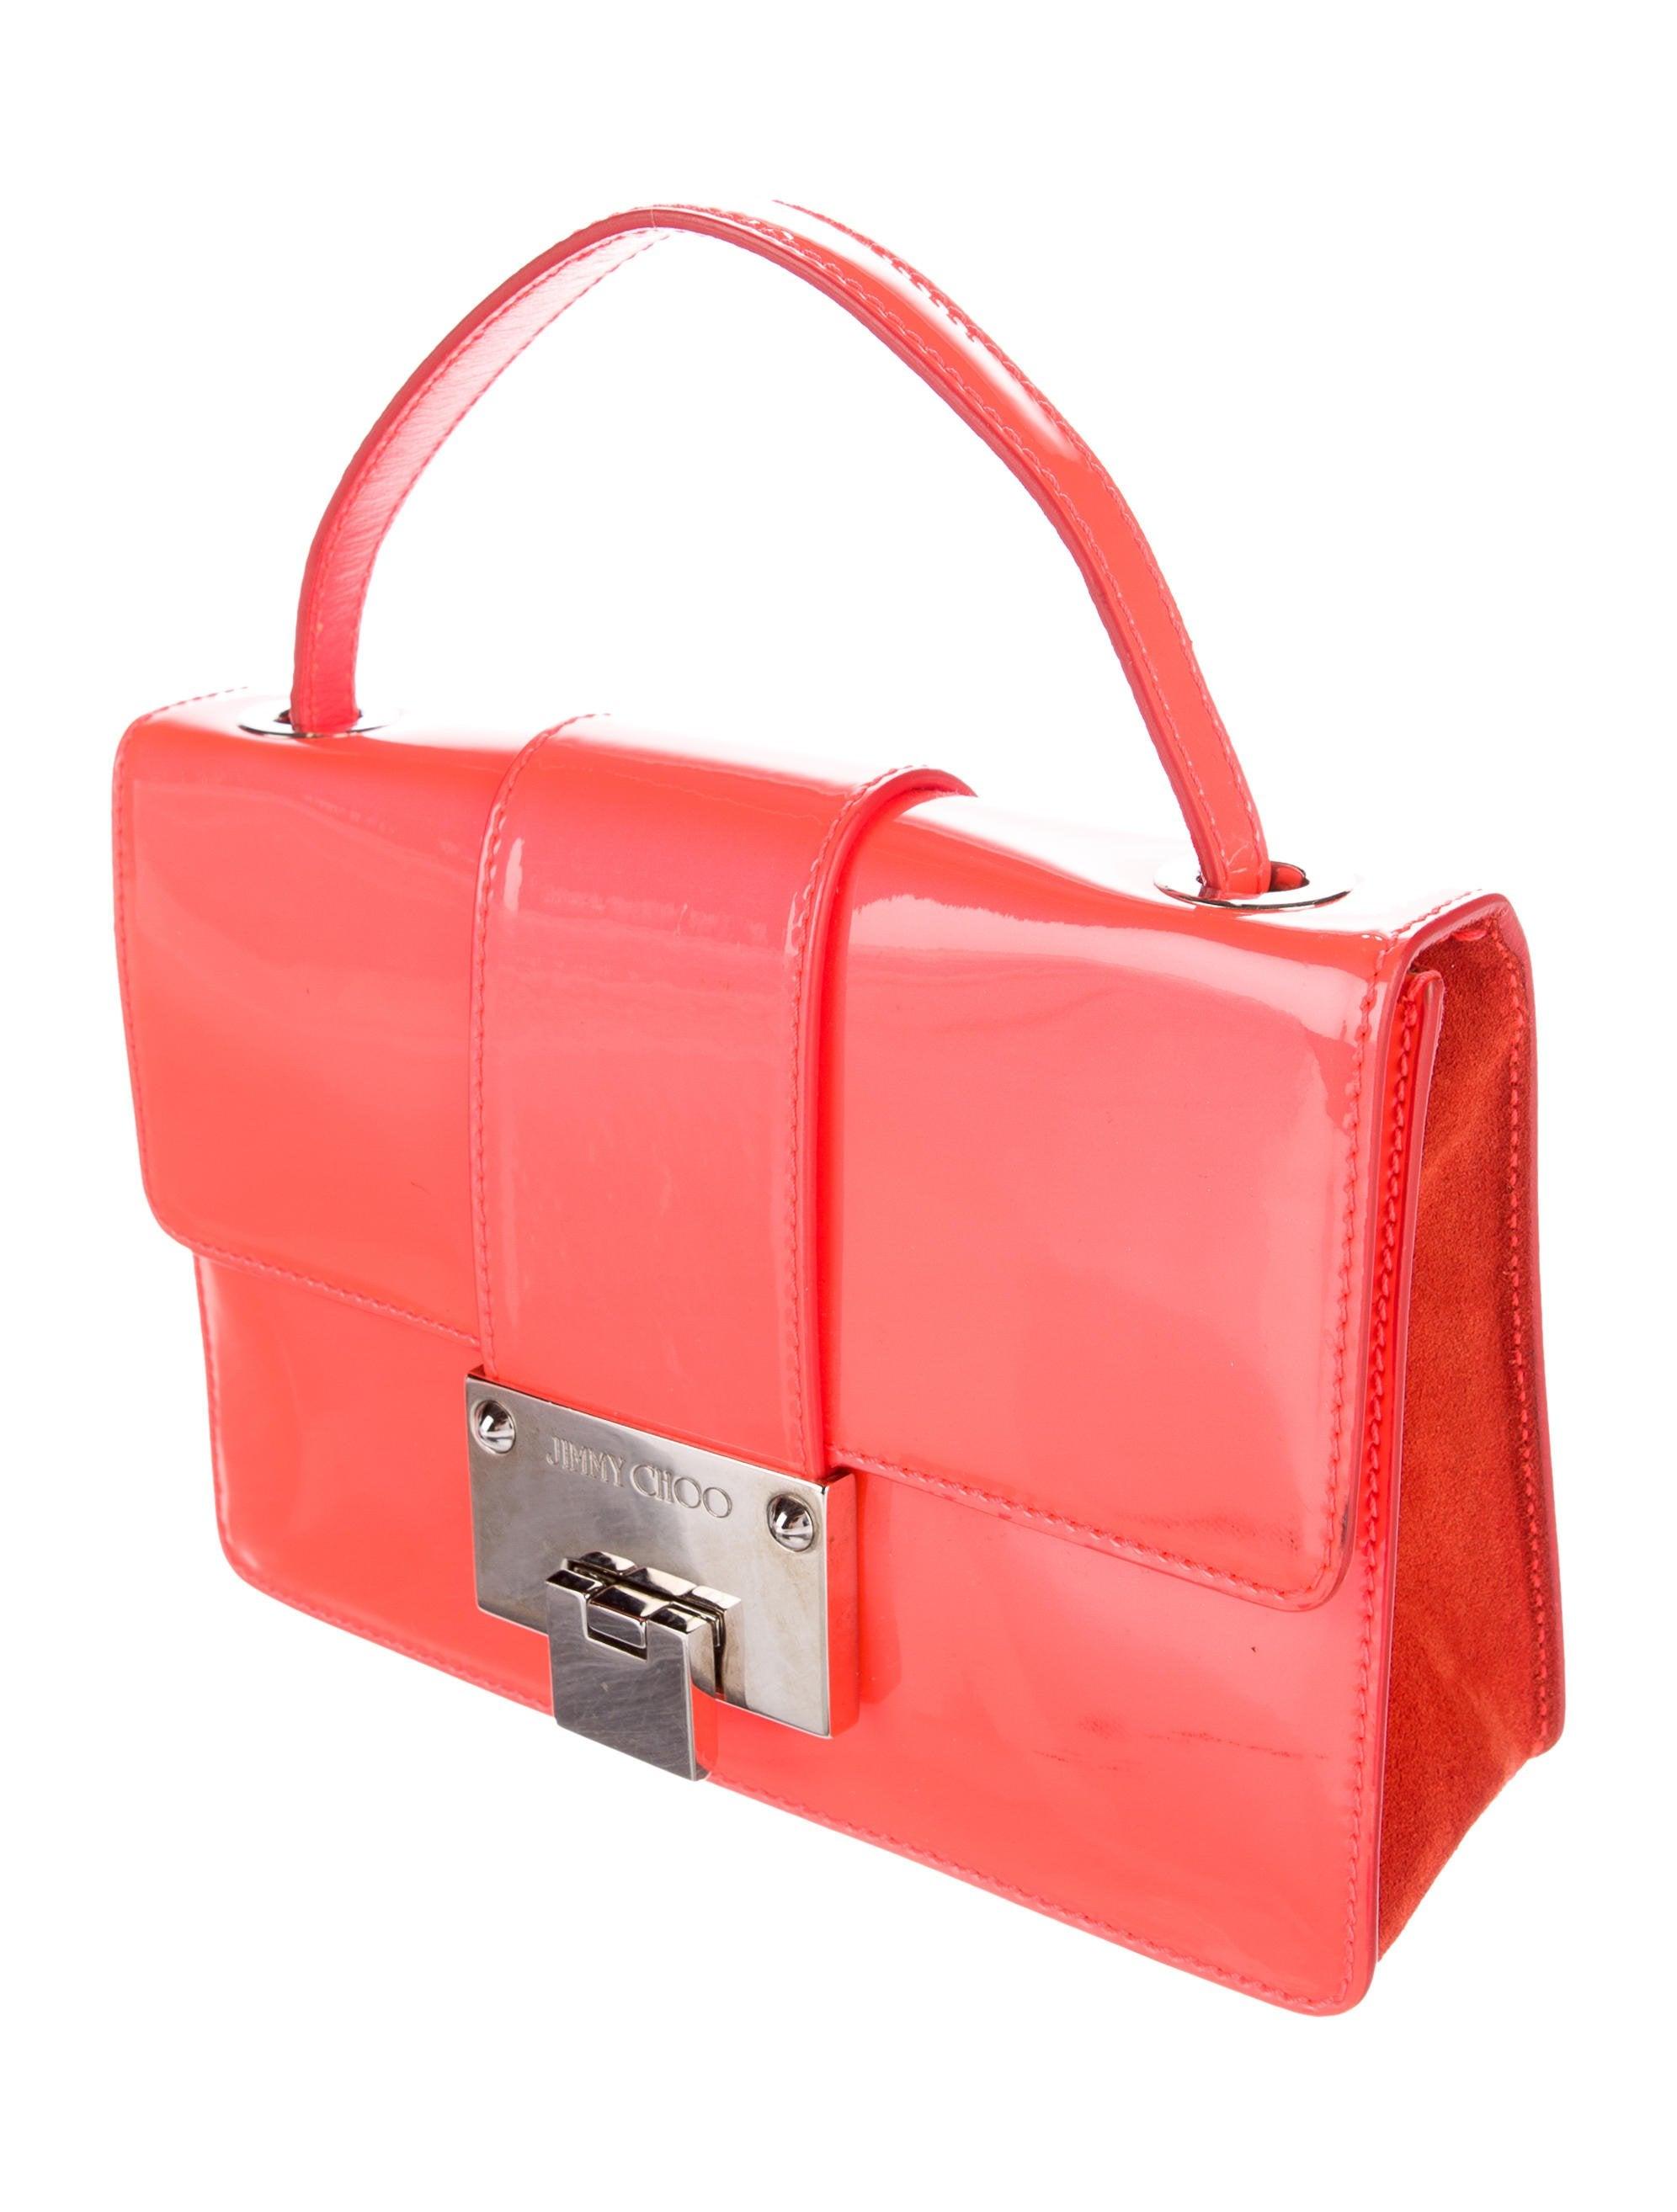 Jimmy Choo Patent Leather Rebel Crossbody Bag - Handbags ...